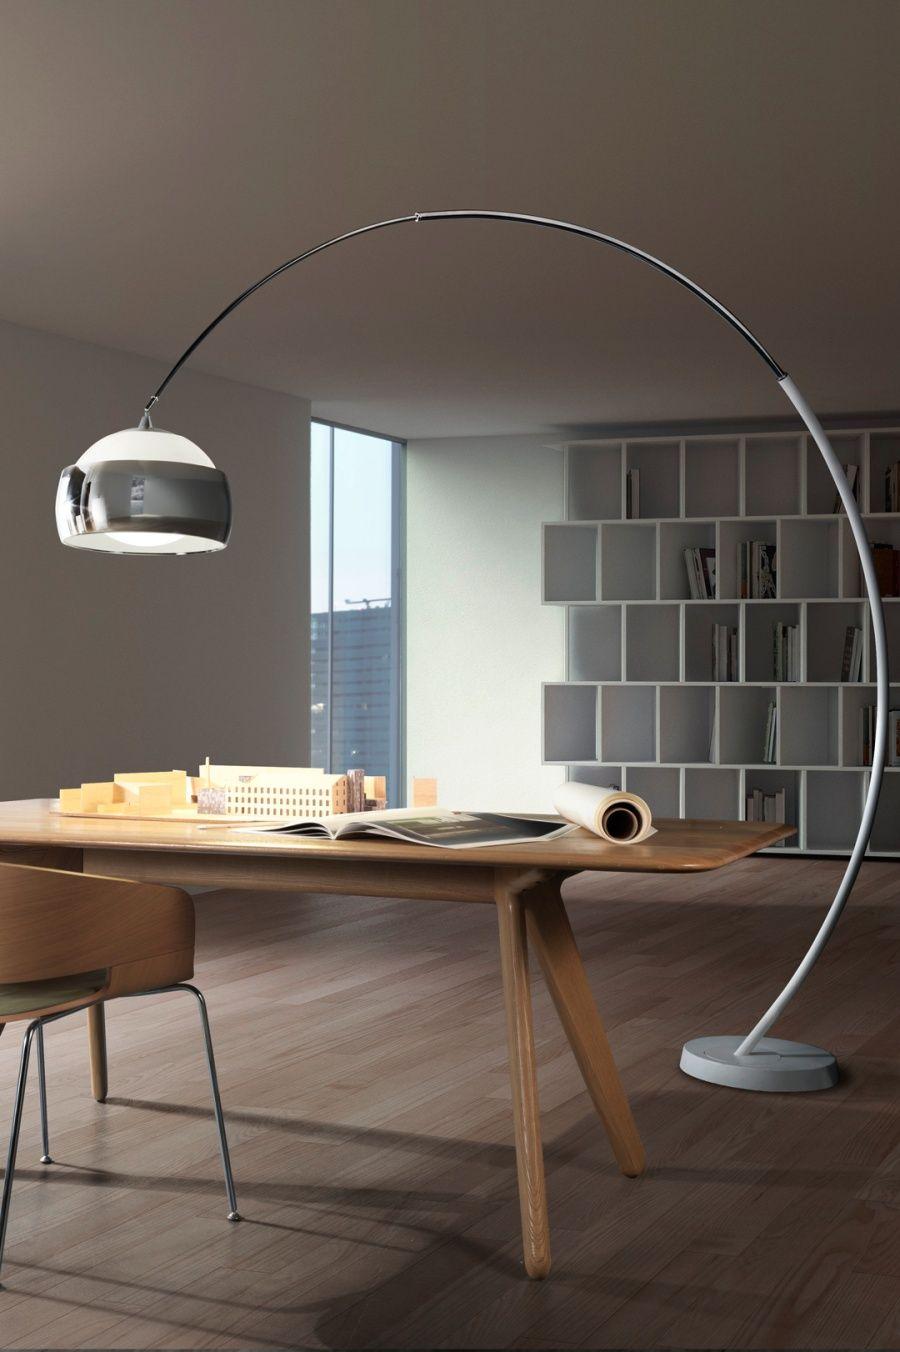 Extra Large Long Reach Floor Lamp 2280mm Reach Stylish Floor Lamp Arco Floor Lamp Cool Floor Lamps